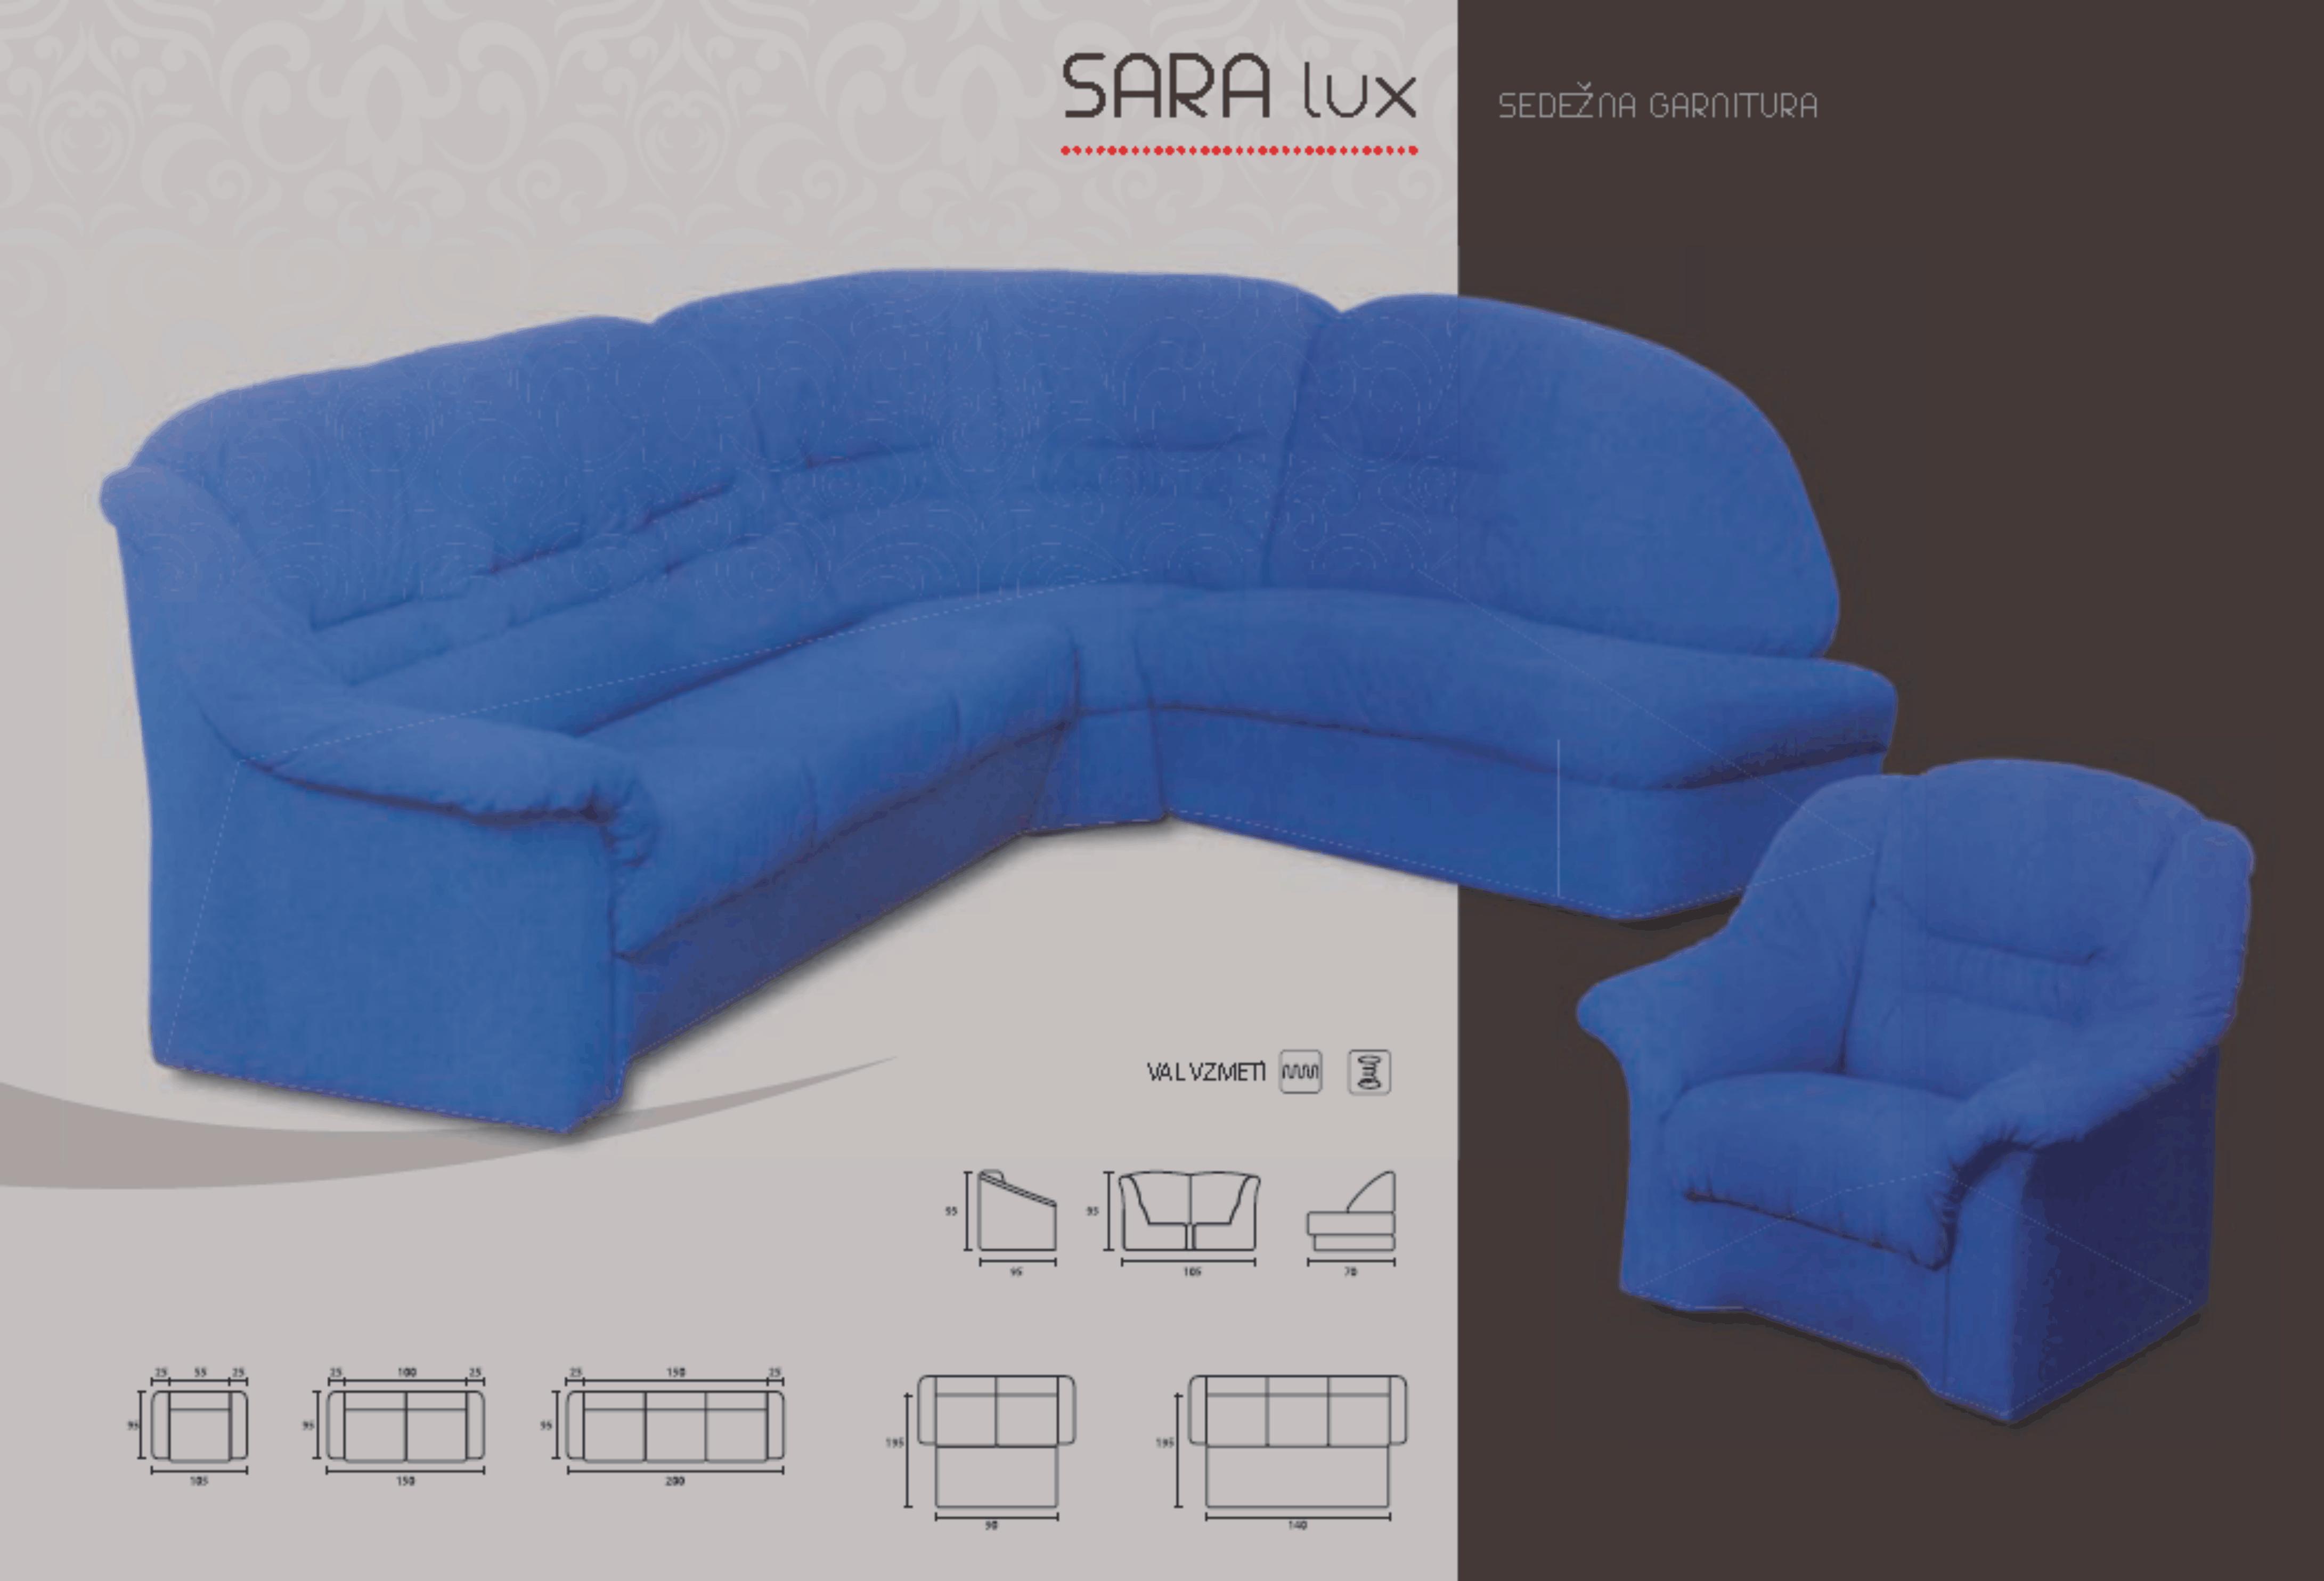 sara_lux_sedezna